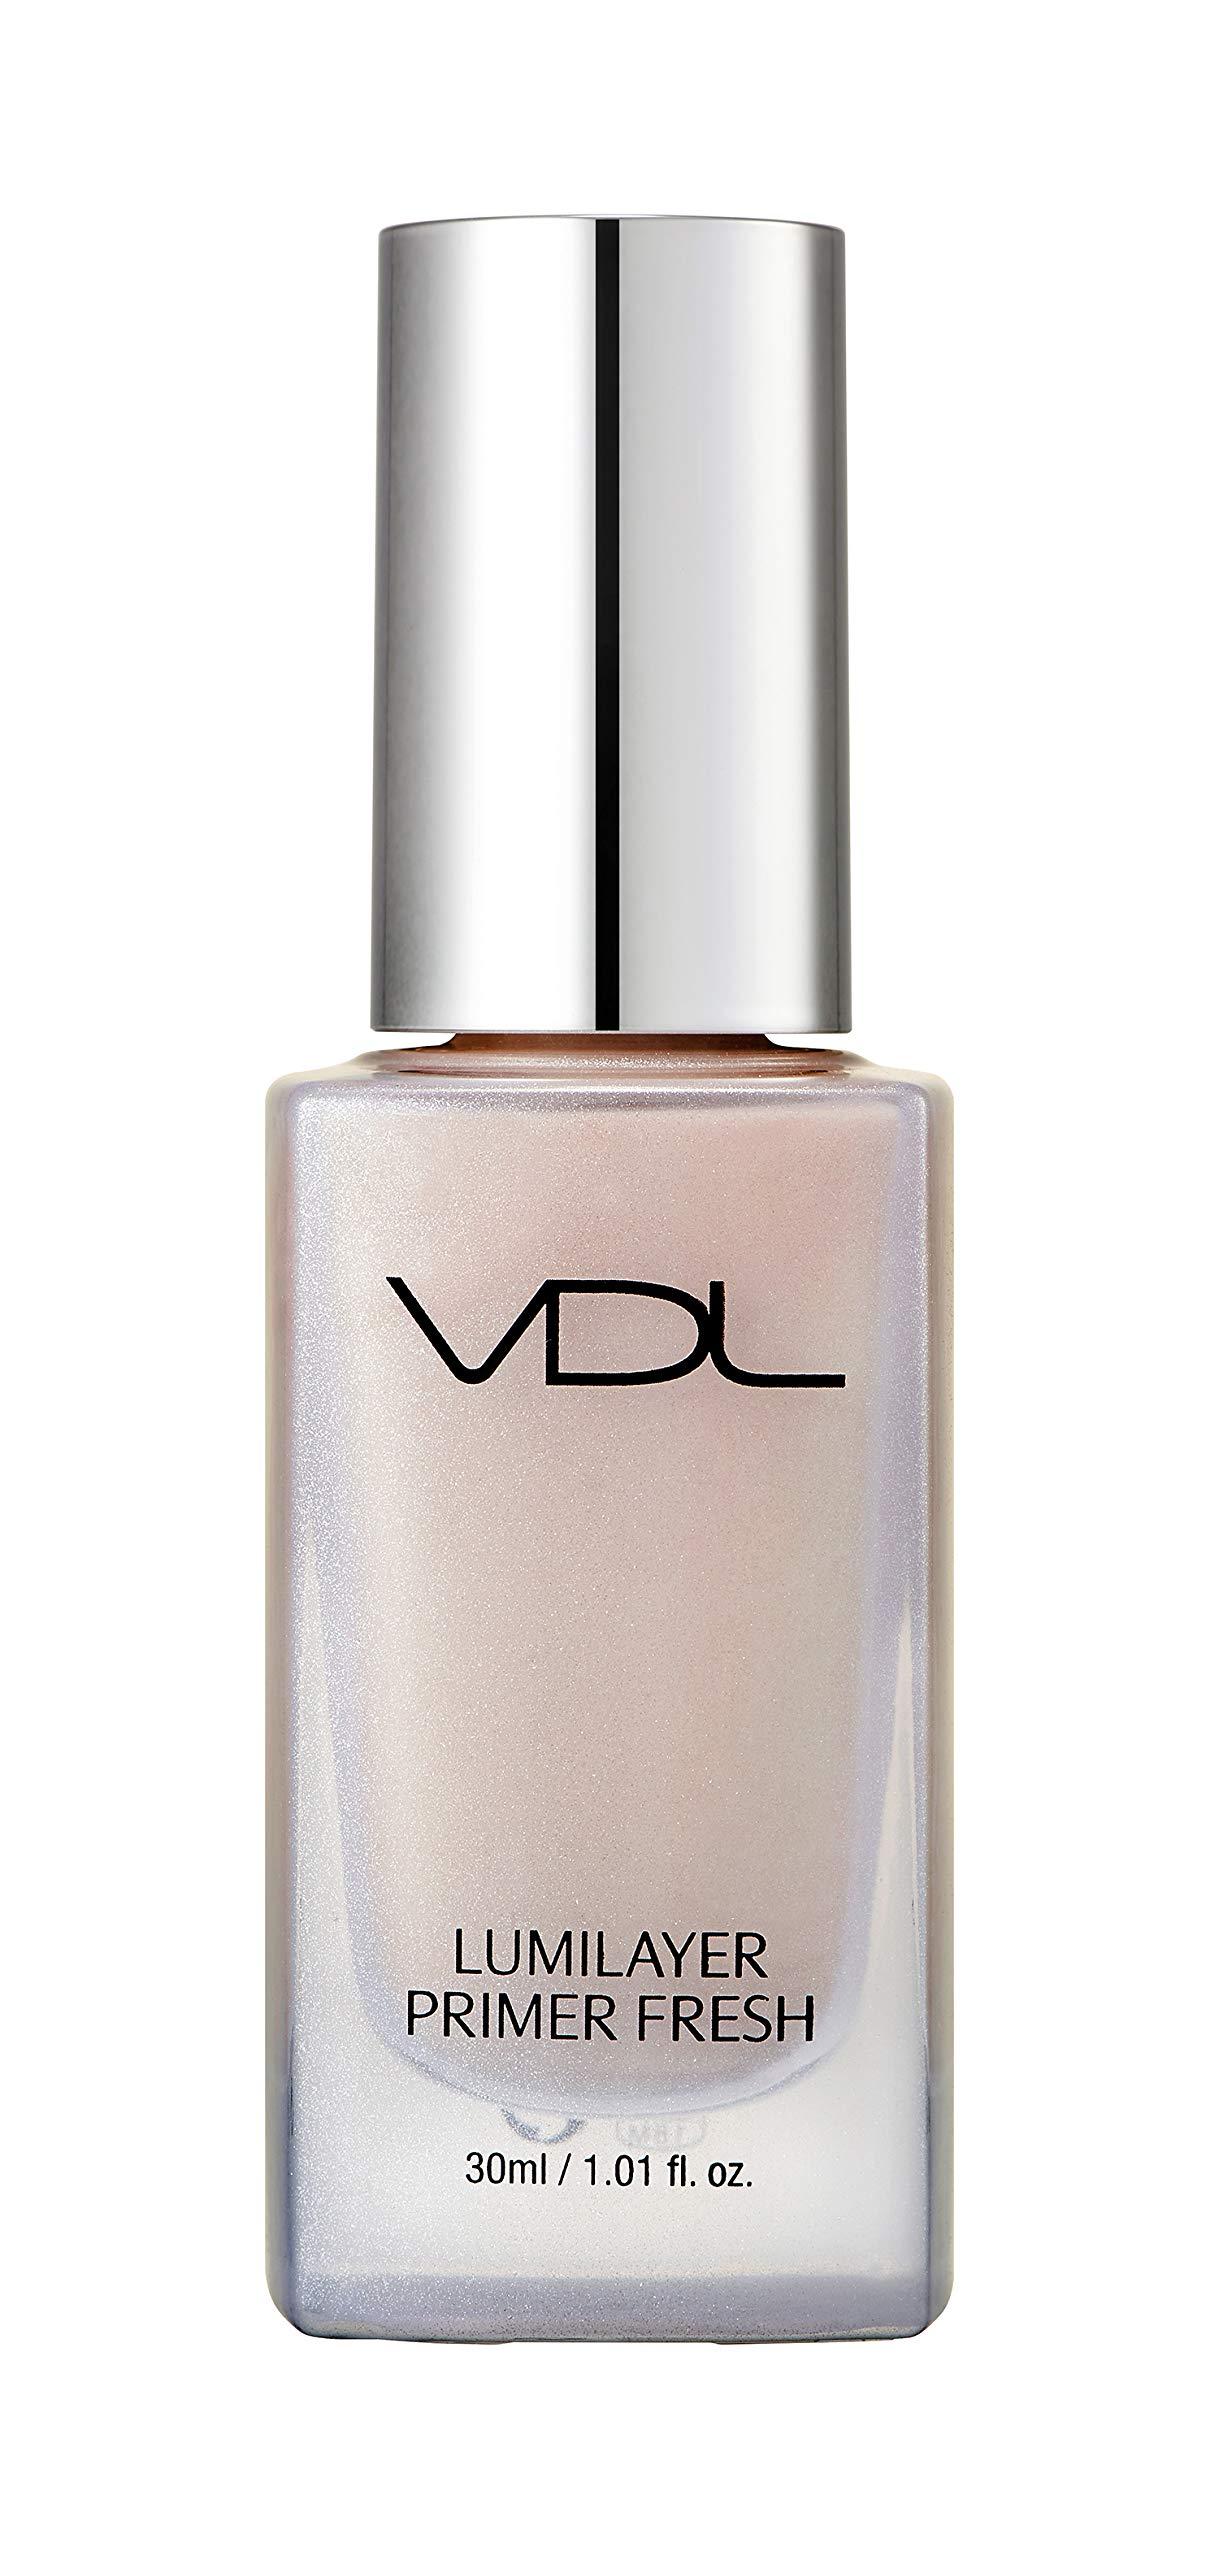 VDL Cosmetics Lumilayer Primer Fresh, 30 g.